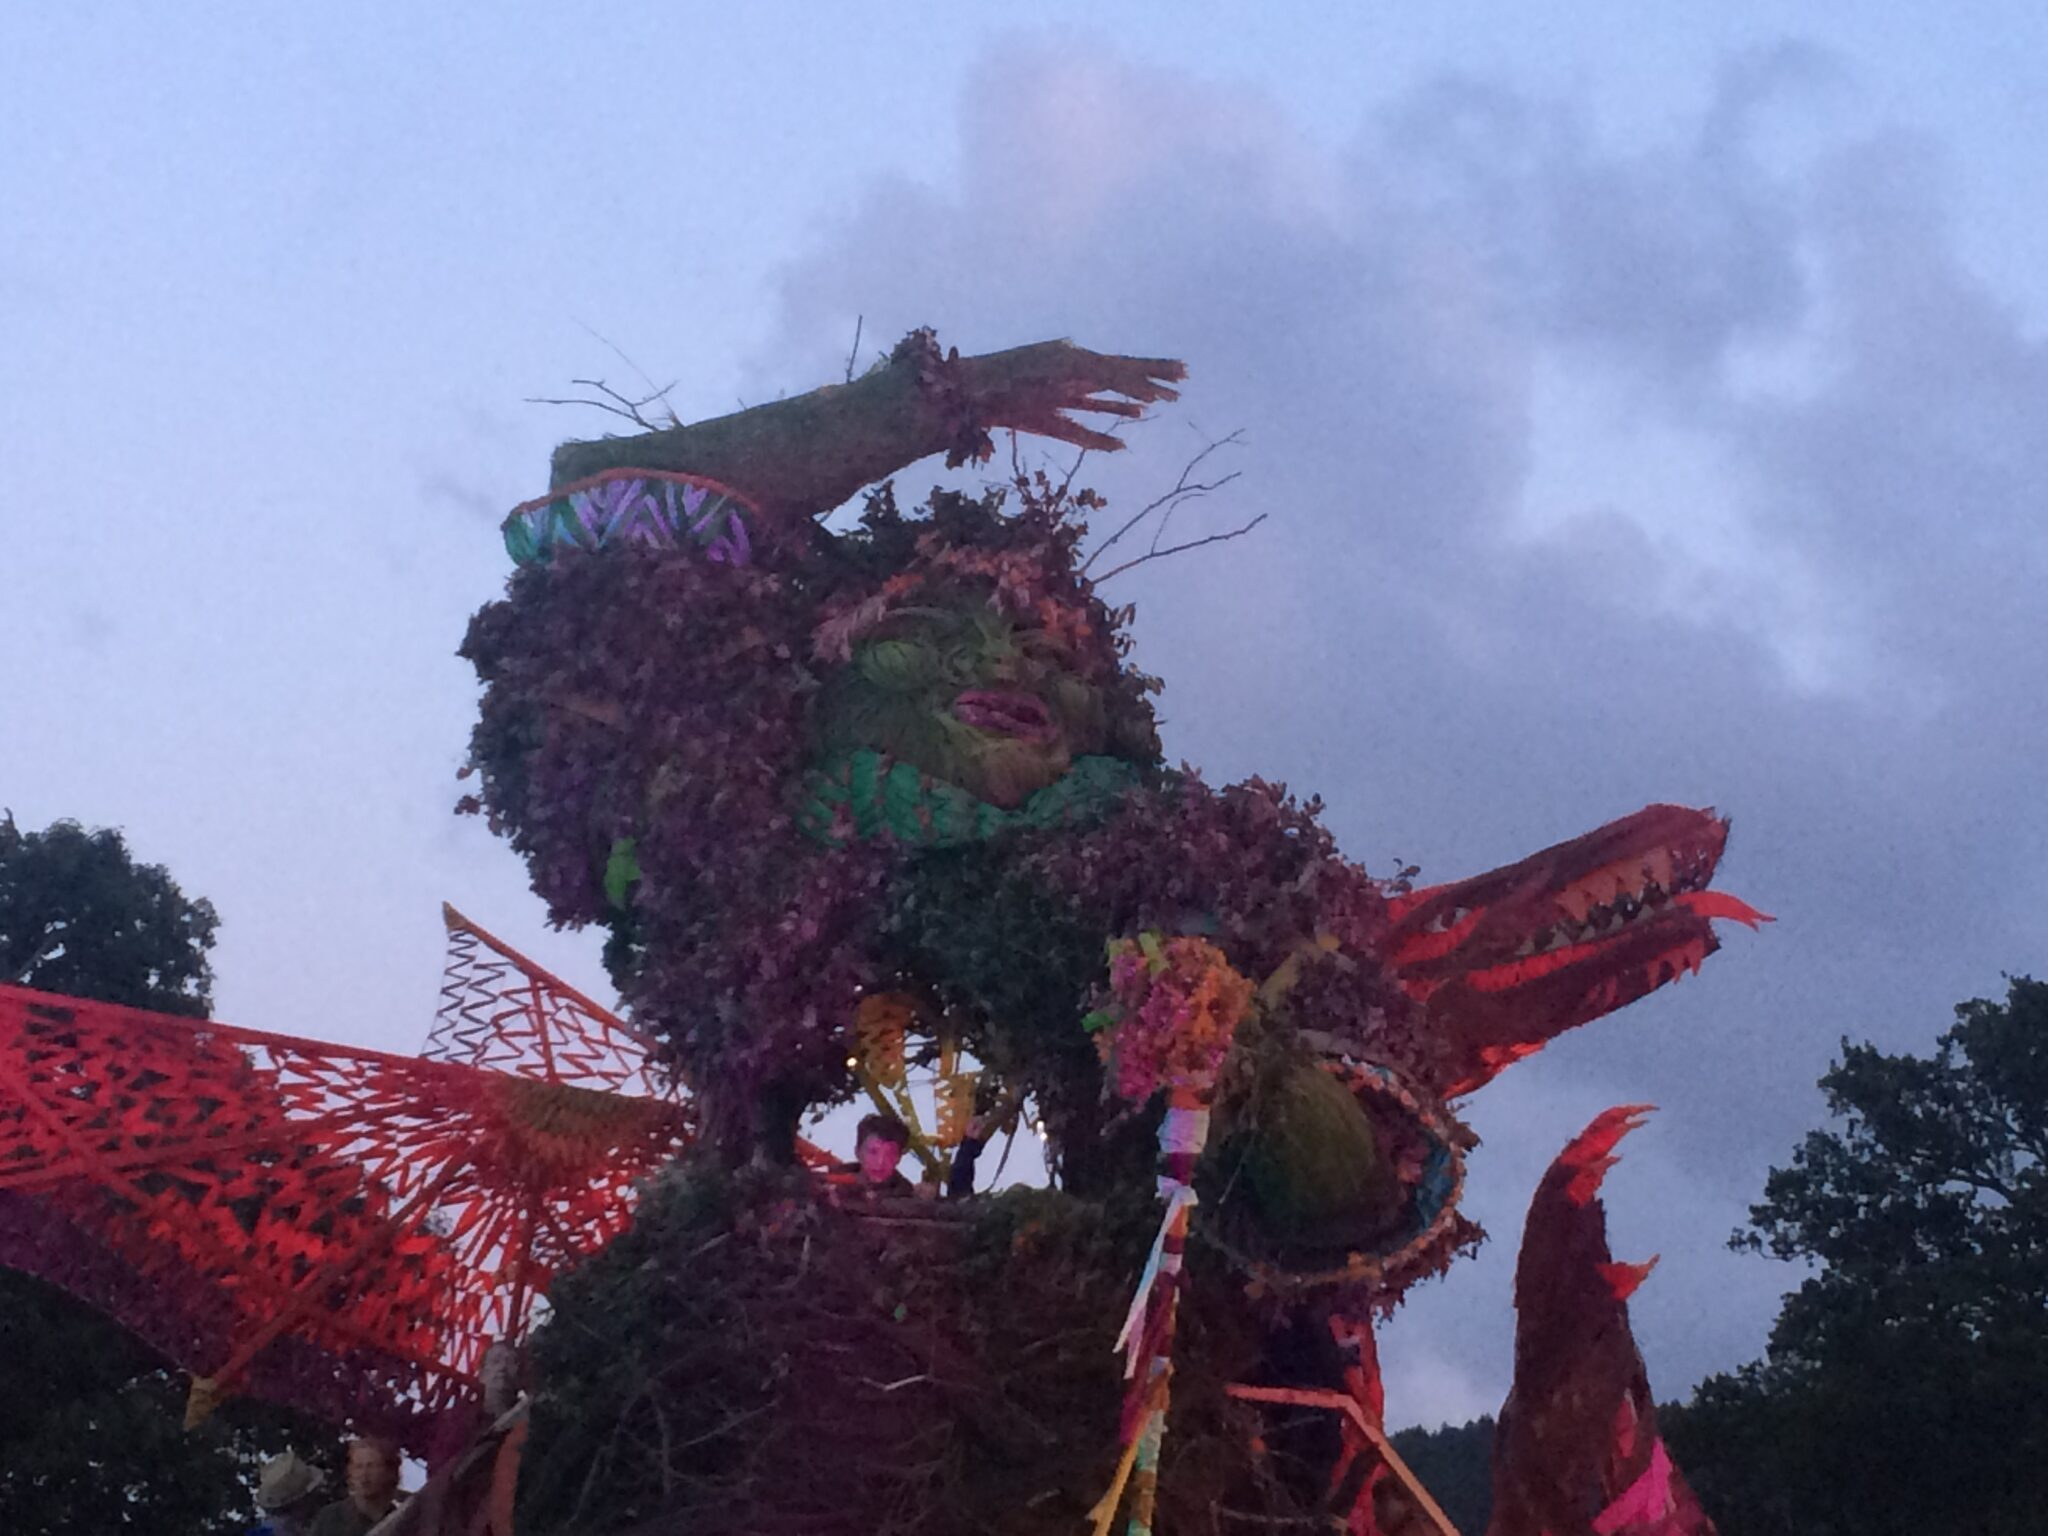 Green Man and dragon